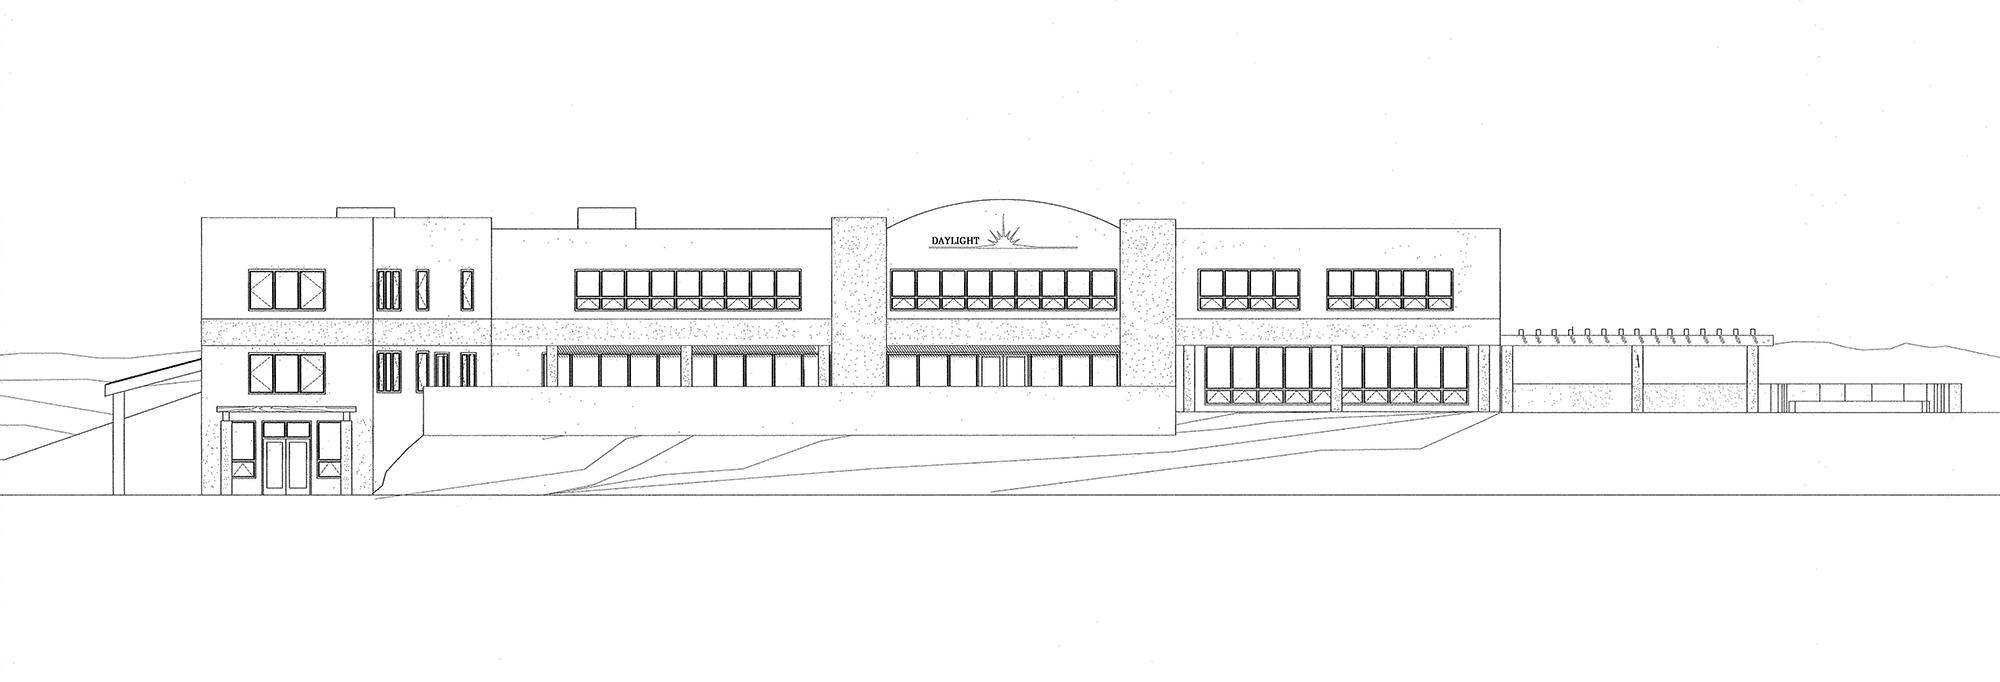 Daylight Office Building Info_Page_1C.jpg